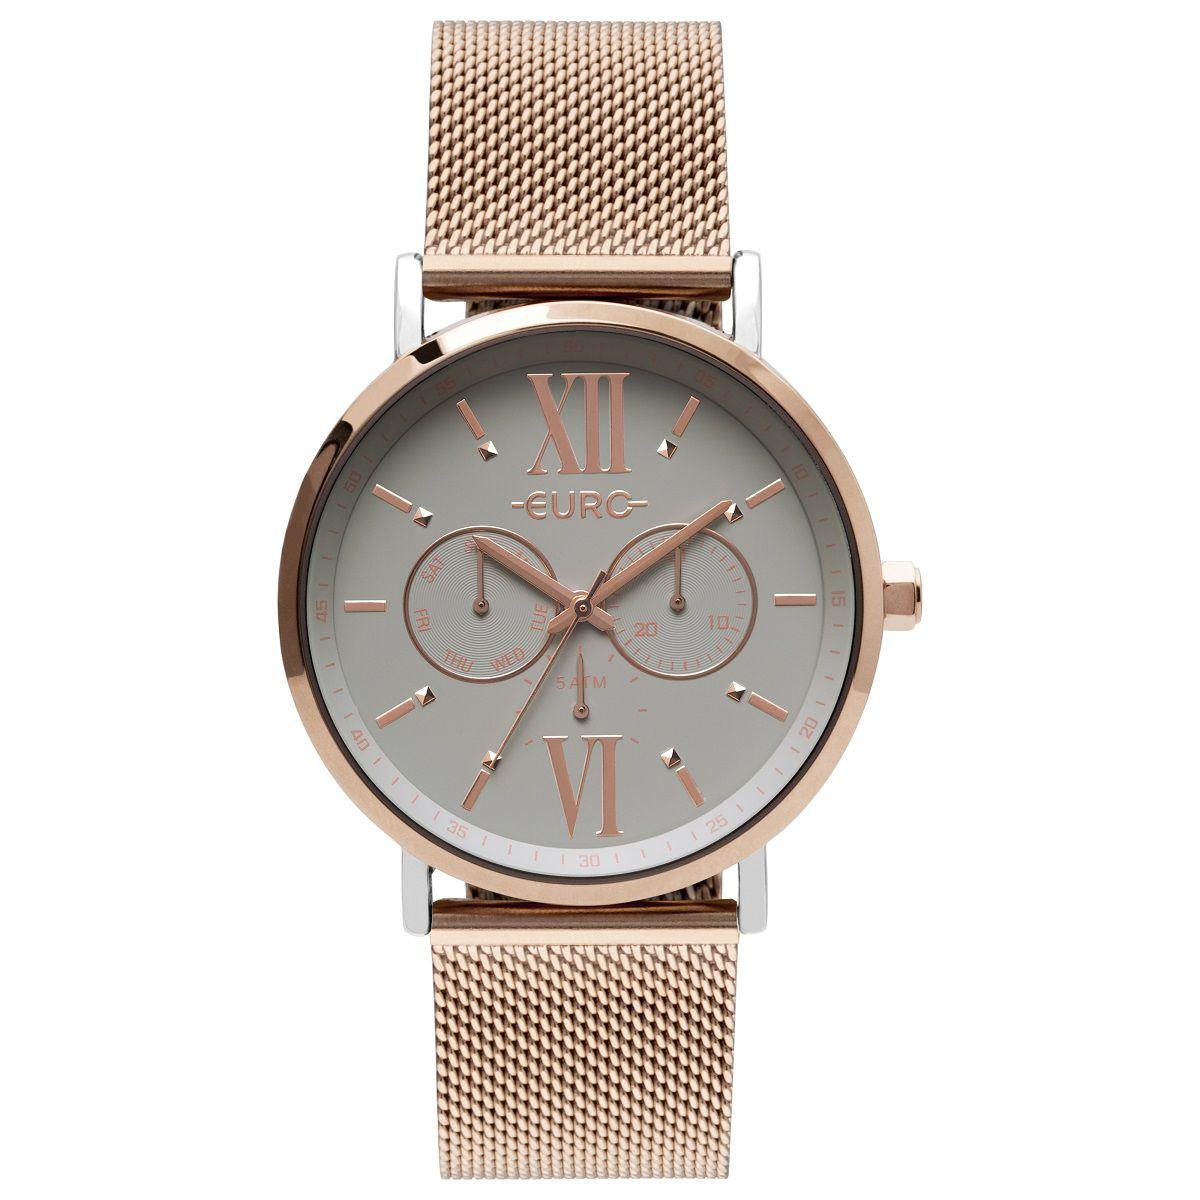 Relógio Feminino Euro Multi Glow EU6P29AHA/5K 43mm Aço Rosé